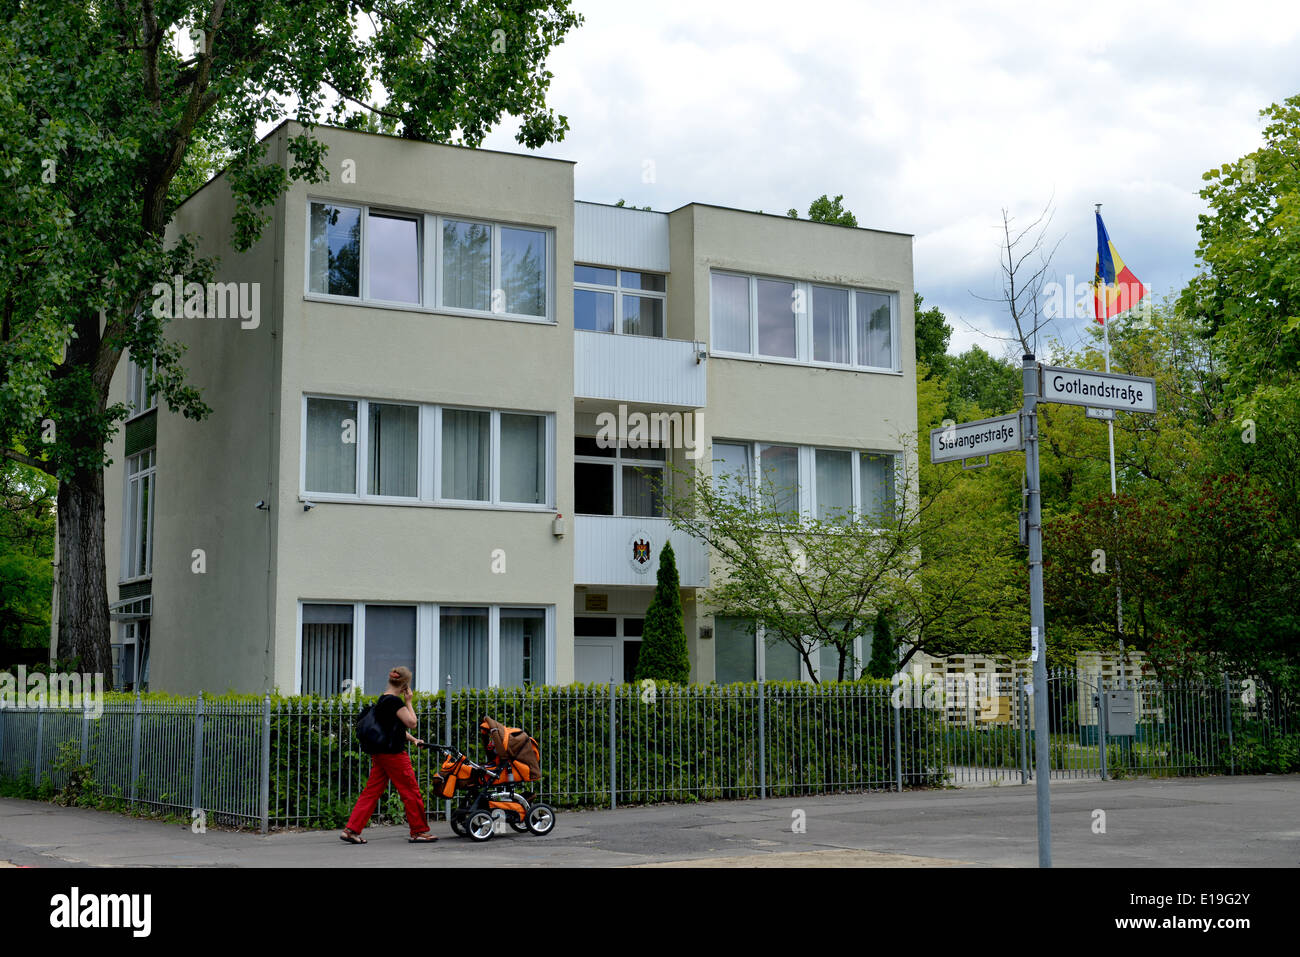 Botschaft Republik Moldau, Stavangerstrasse, Pankow, Berlin, Deutschland - Stock Image